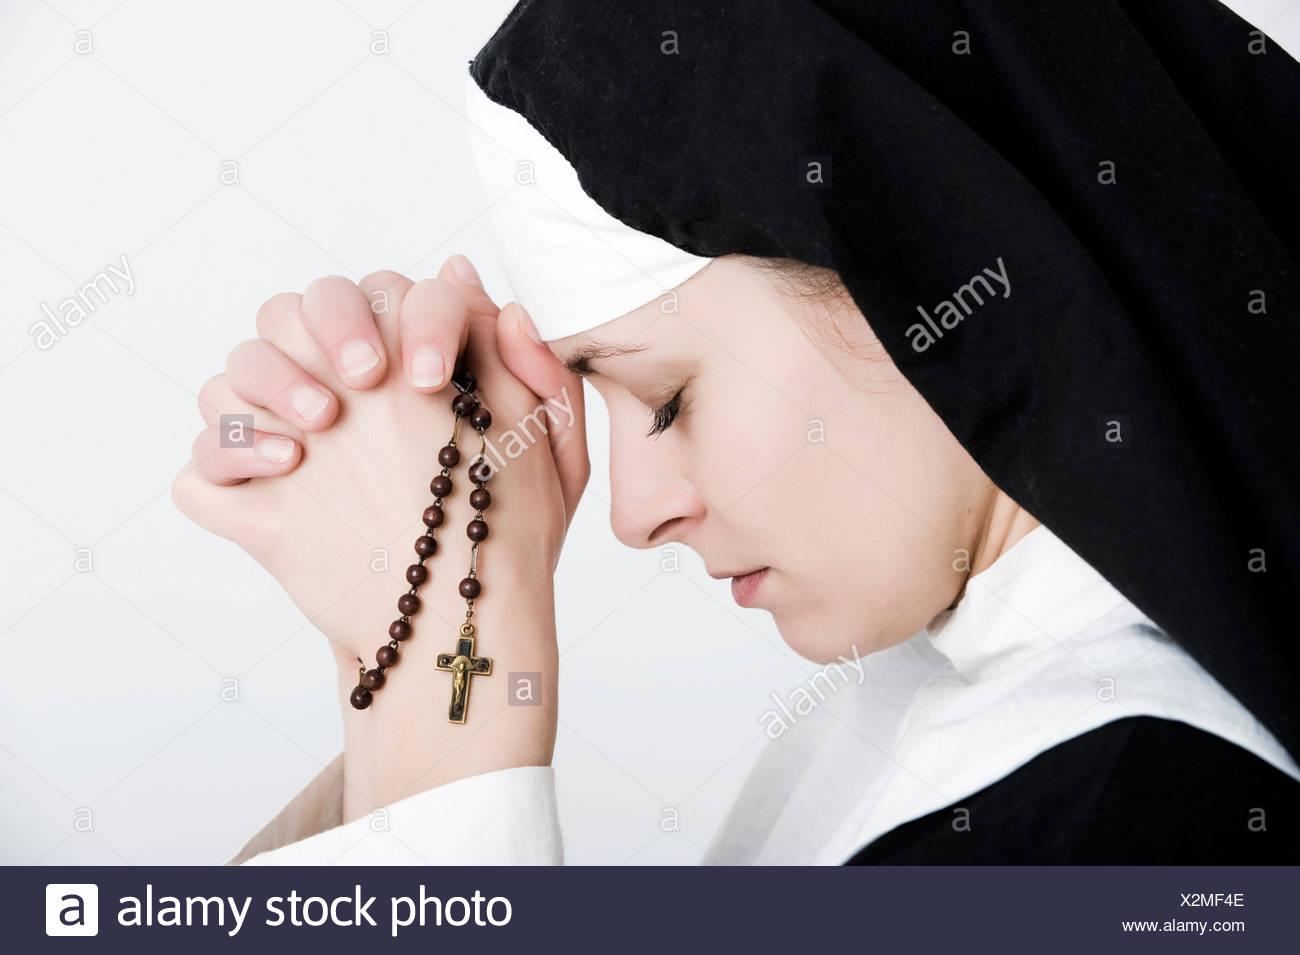 young nun praying the rosary - Stock Image